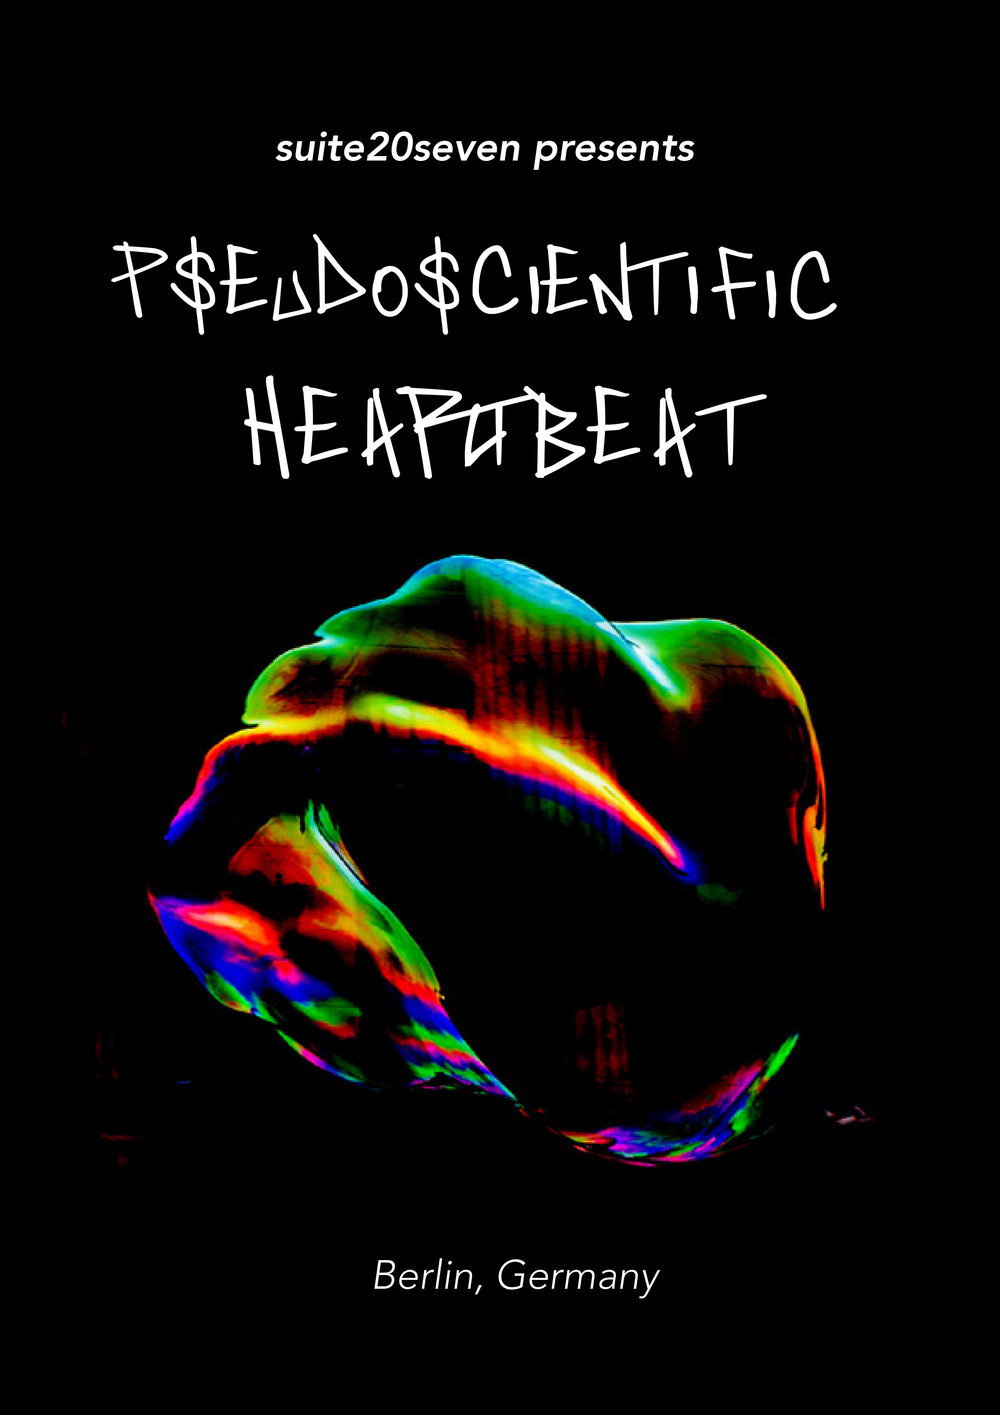 pseudoscientific-heartbeat-1.jpg